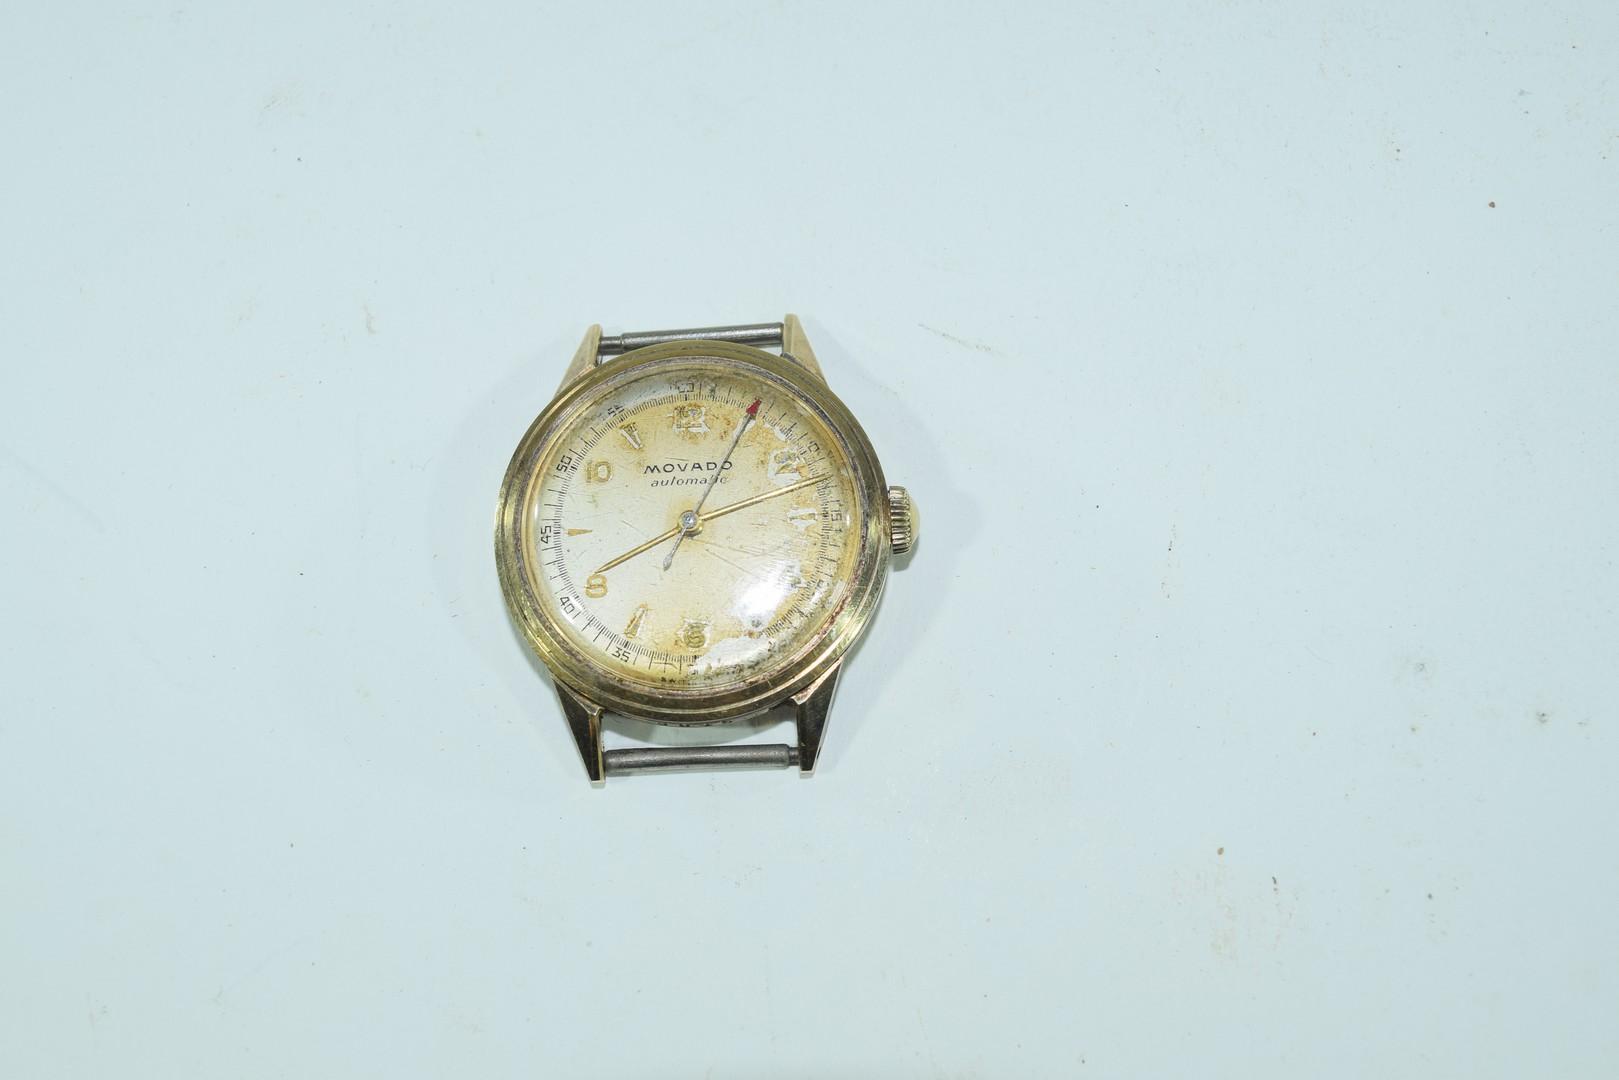 Movado gents yellow metal automatic wrist watch